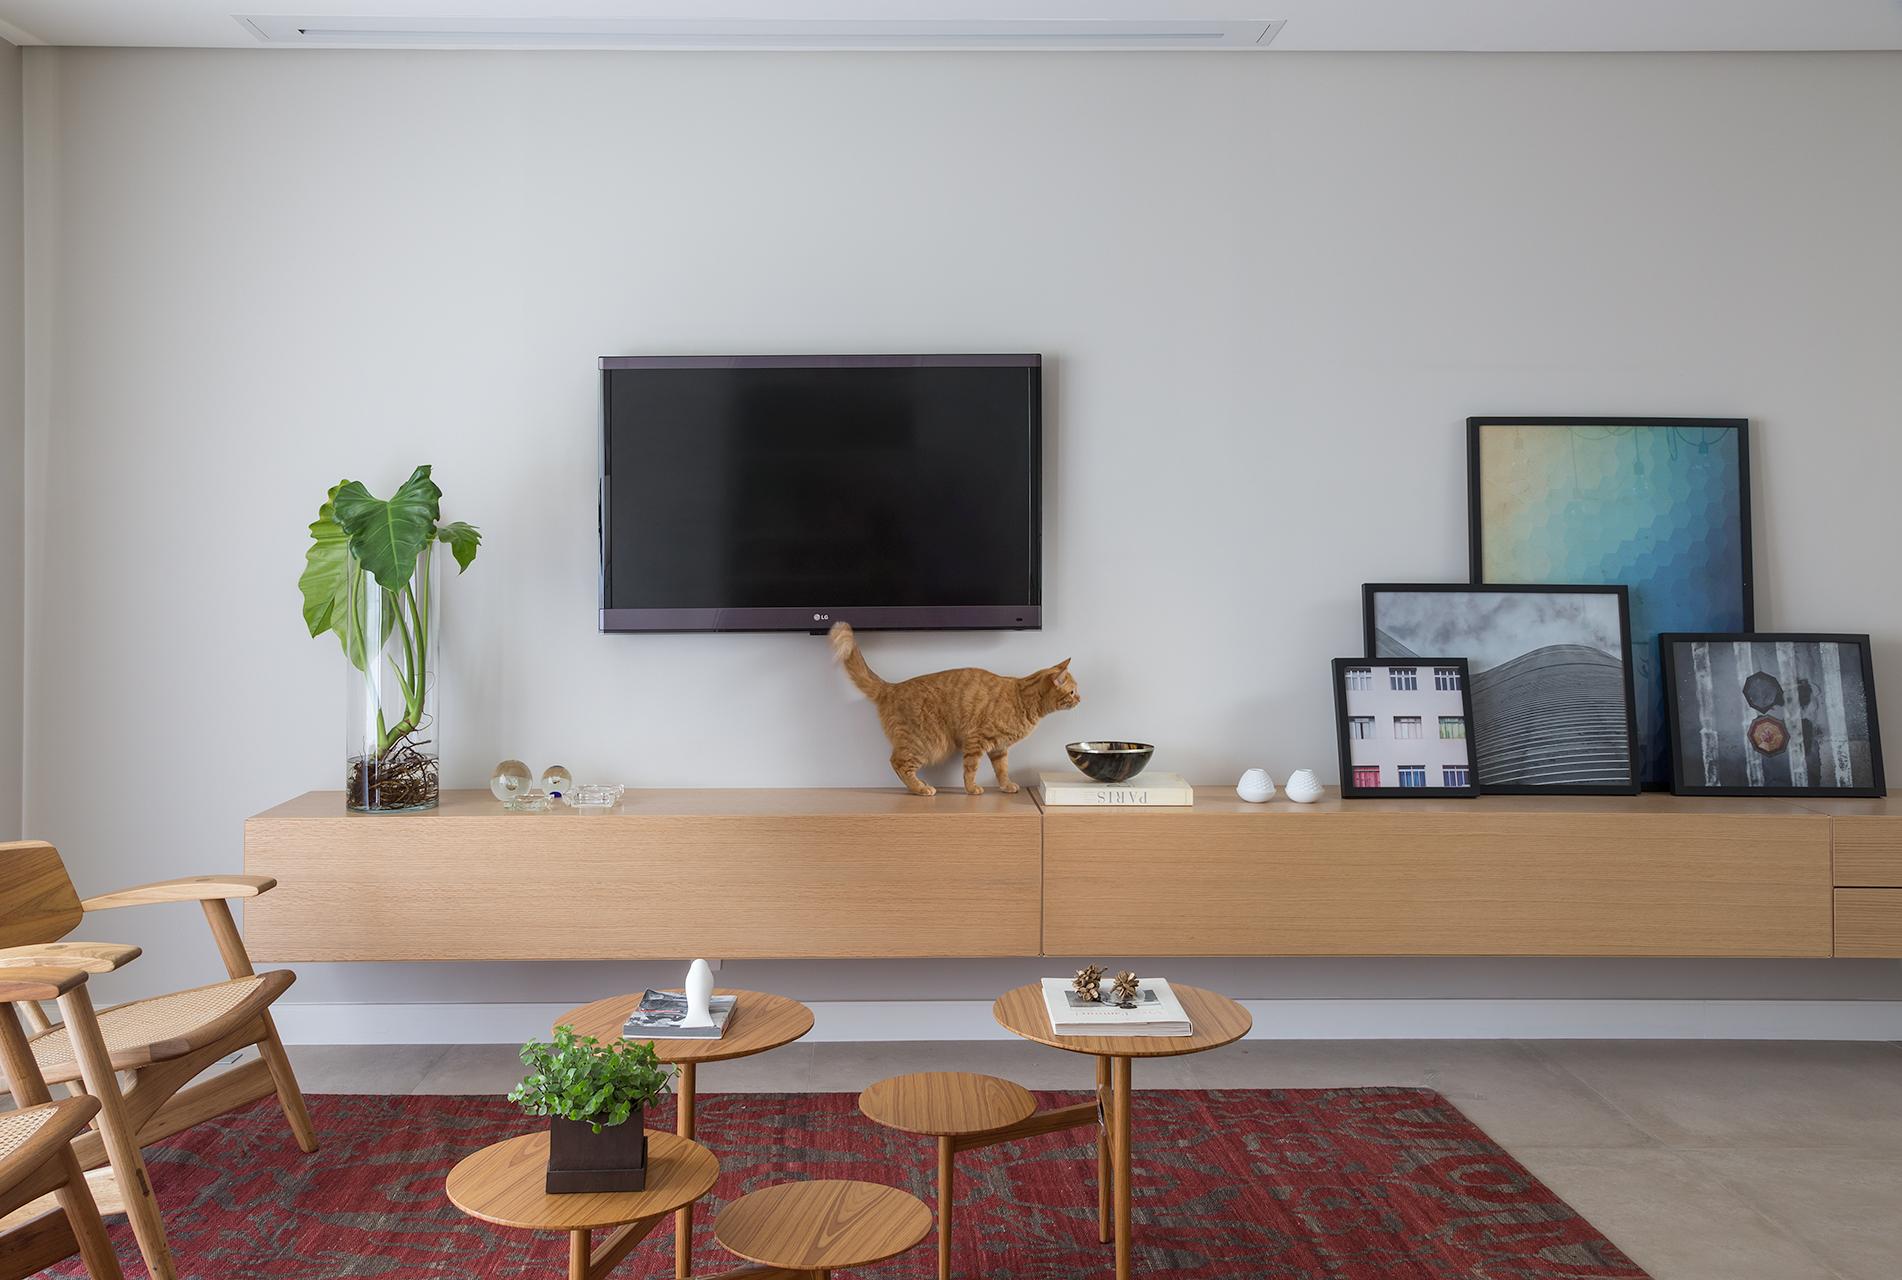 Bufê minimalista em sala de estar